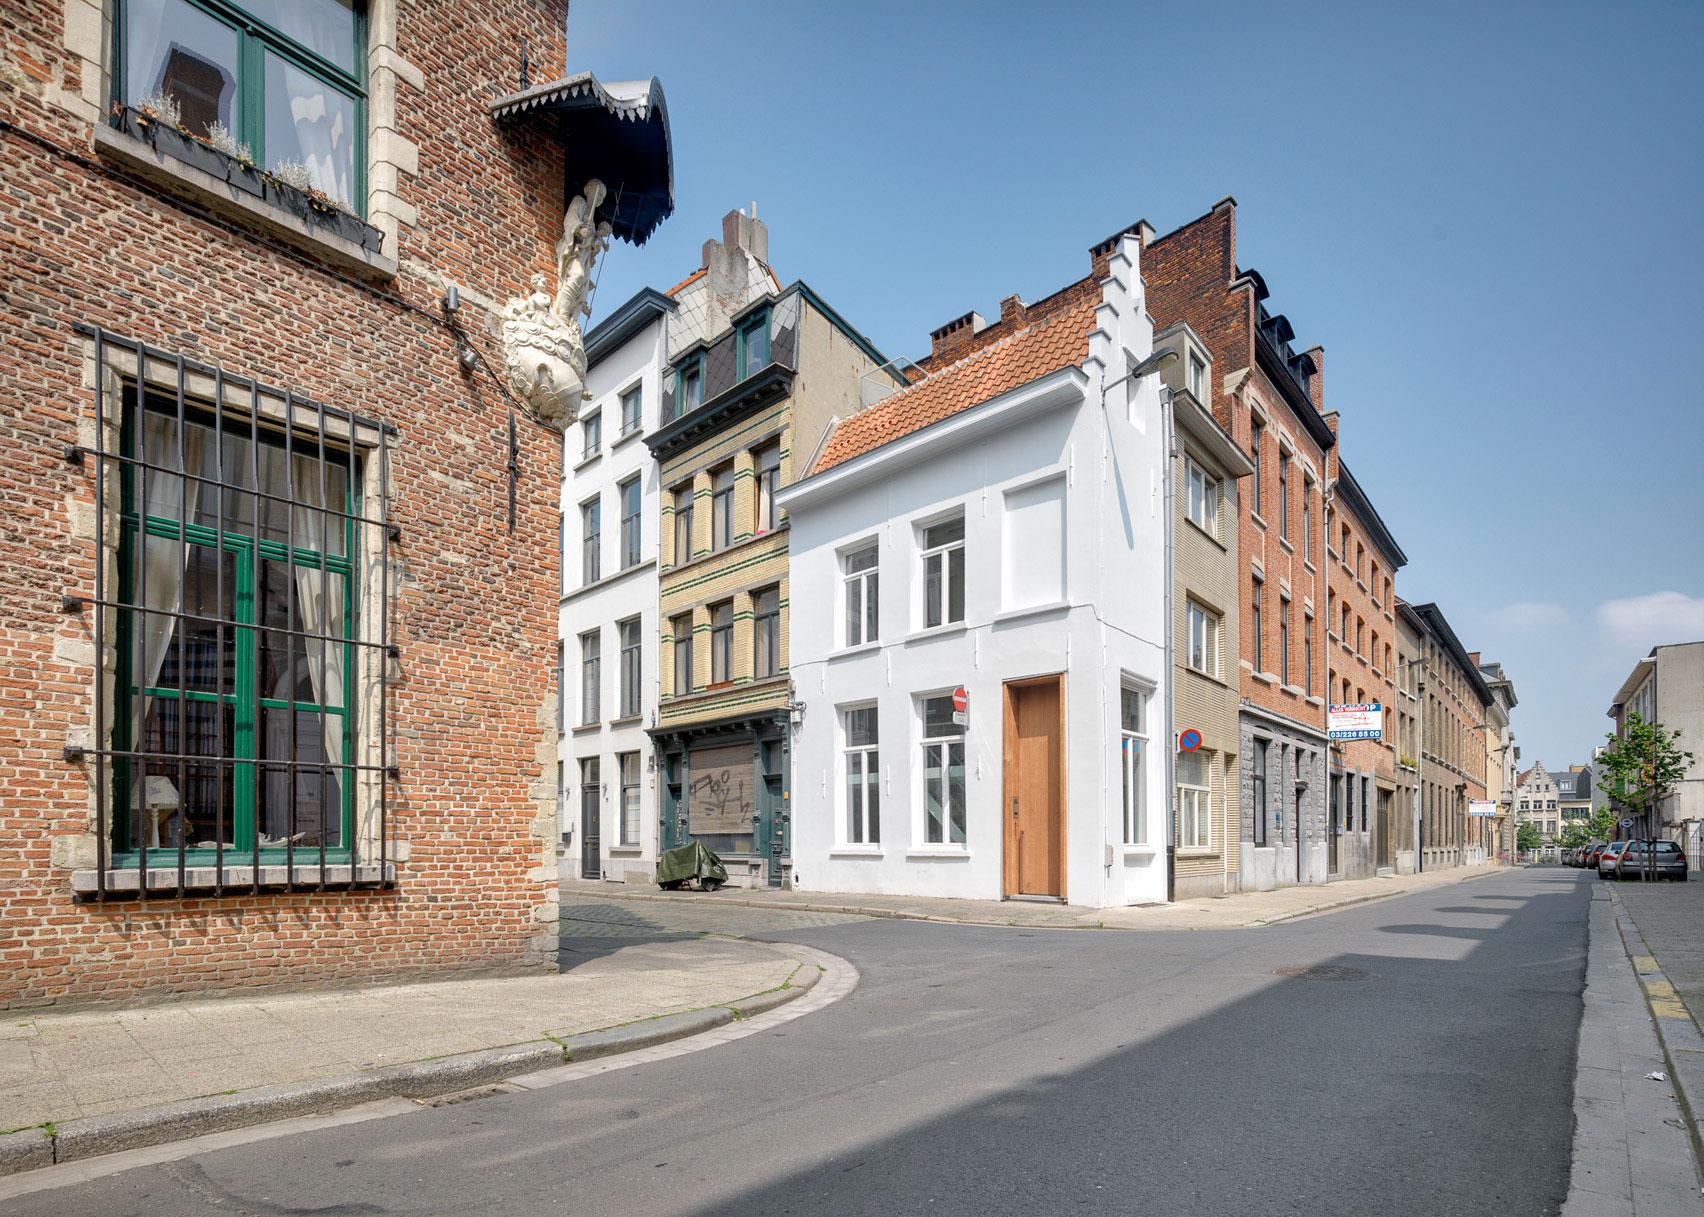 One Room Hotel, Belgium, by DMVA